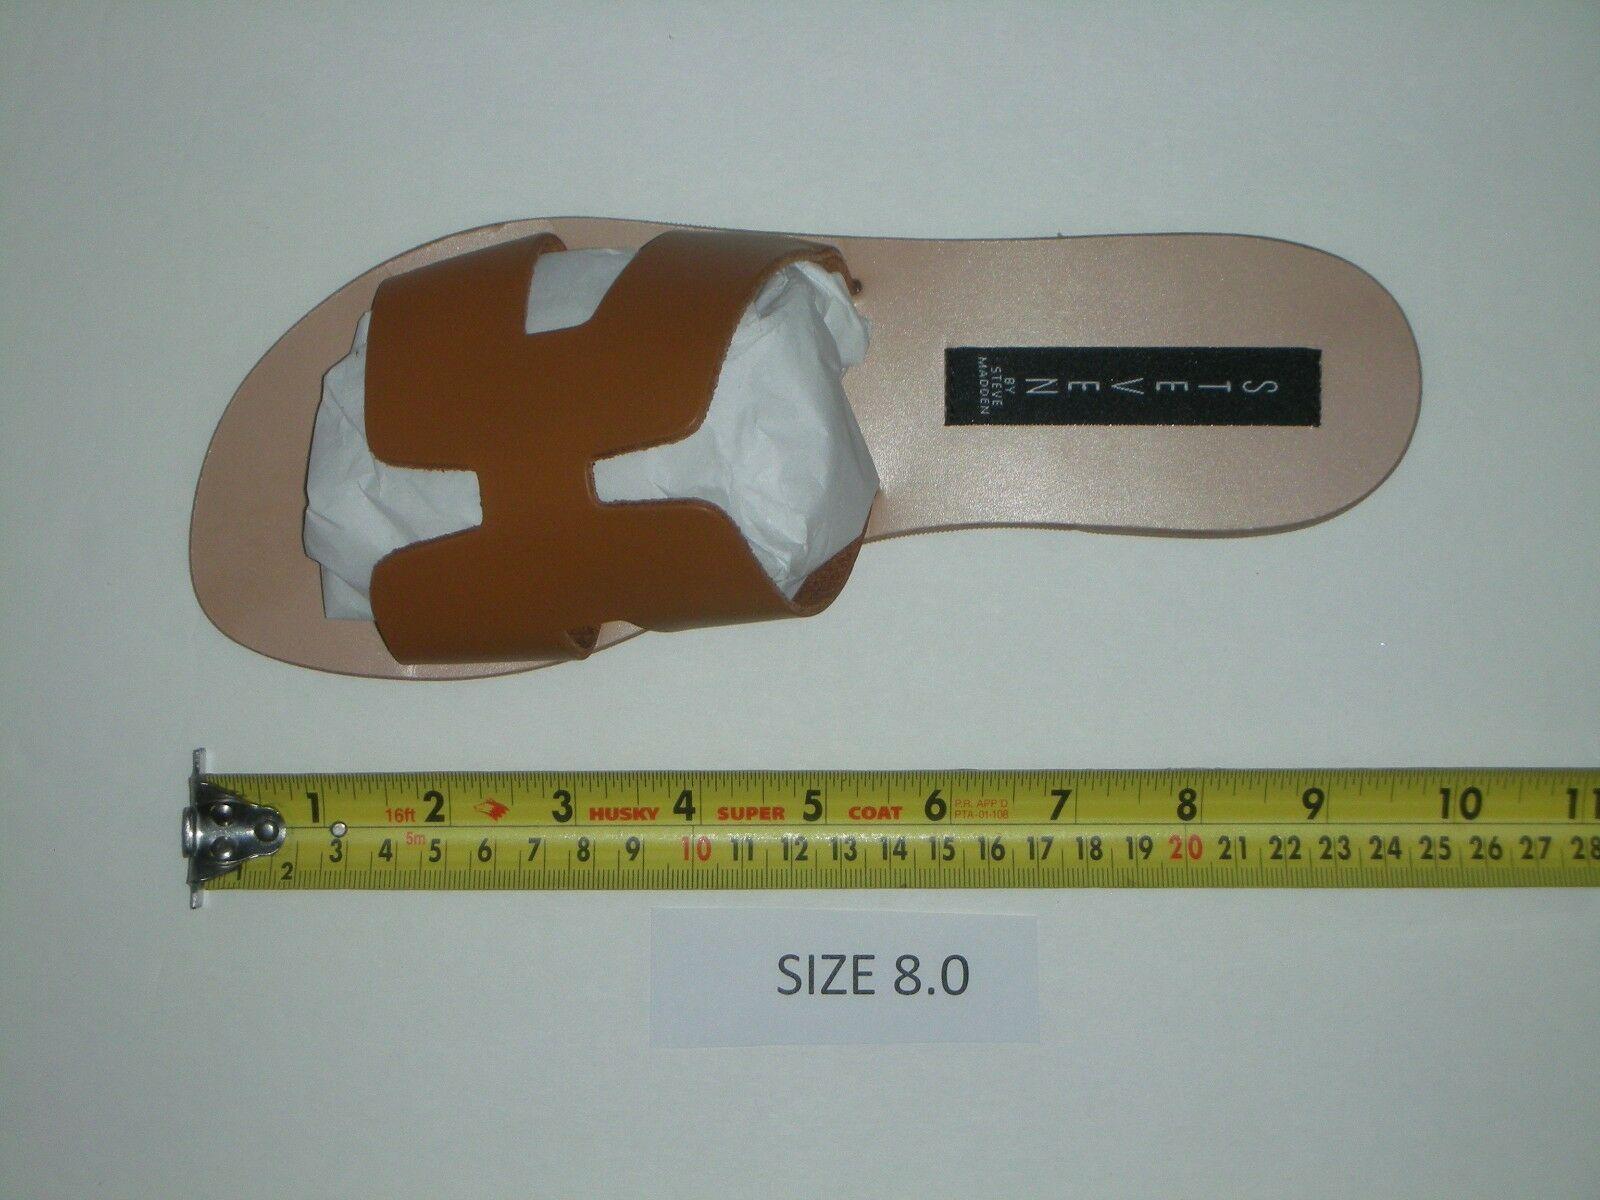 Steven by Steve Madden Greece Flat Sandals Slides Cognac Leather Size 8.0